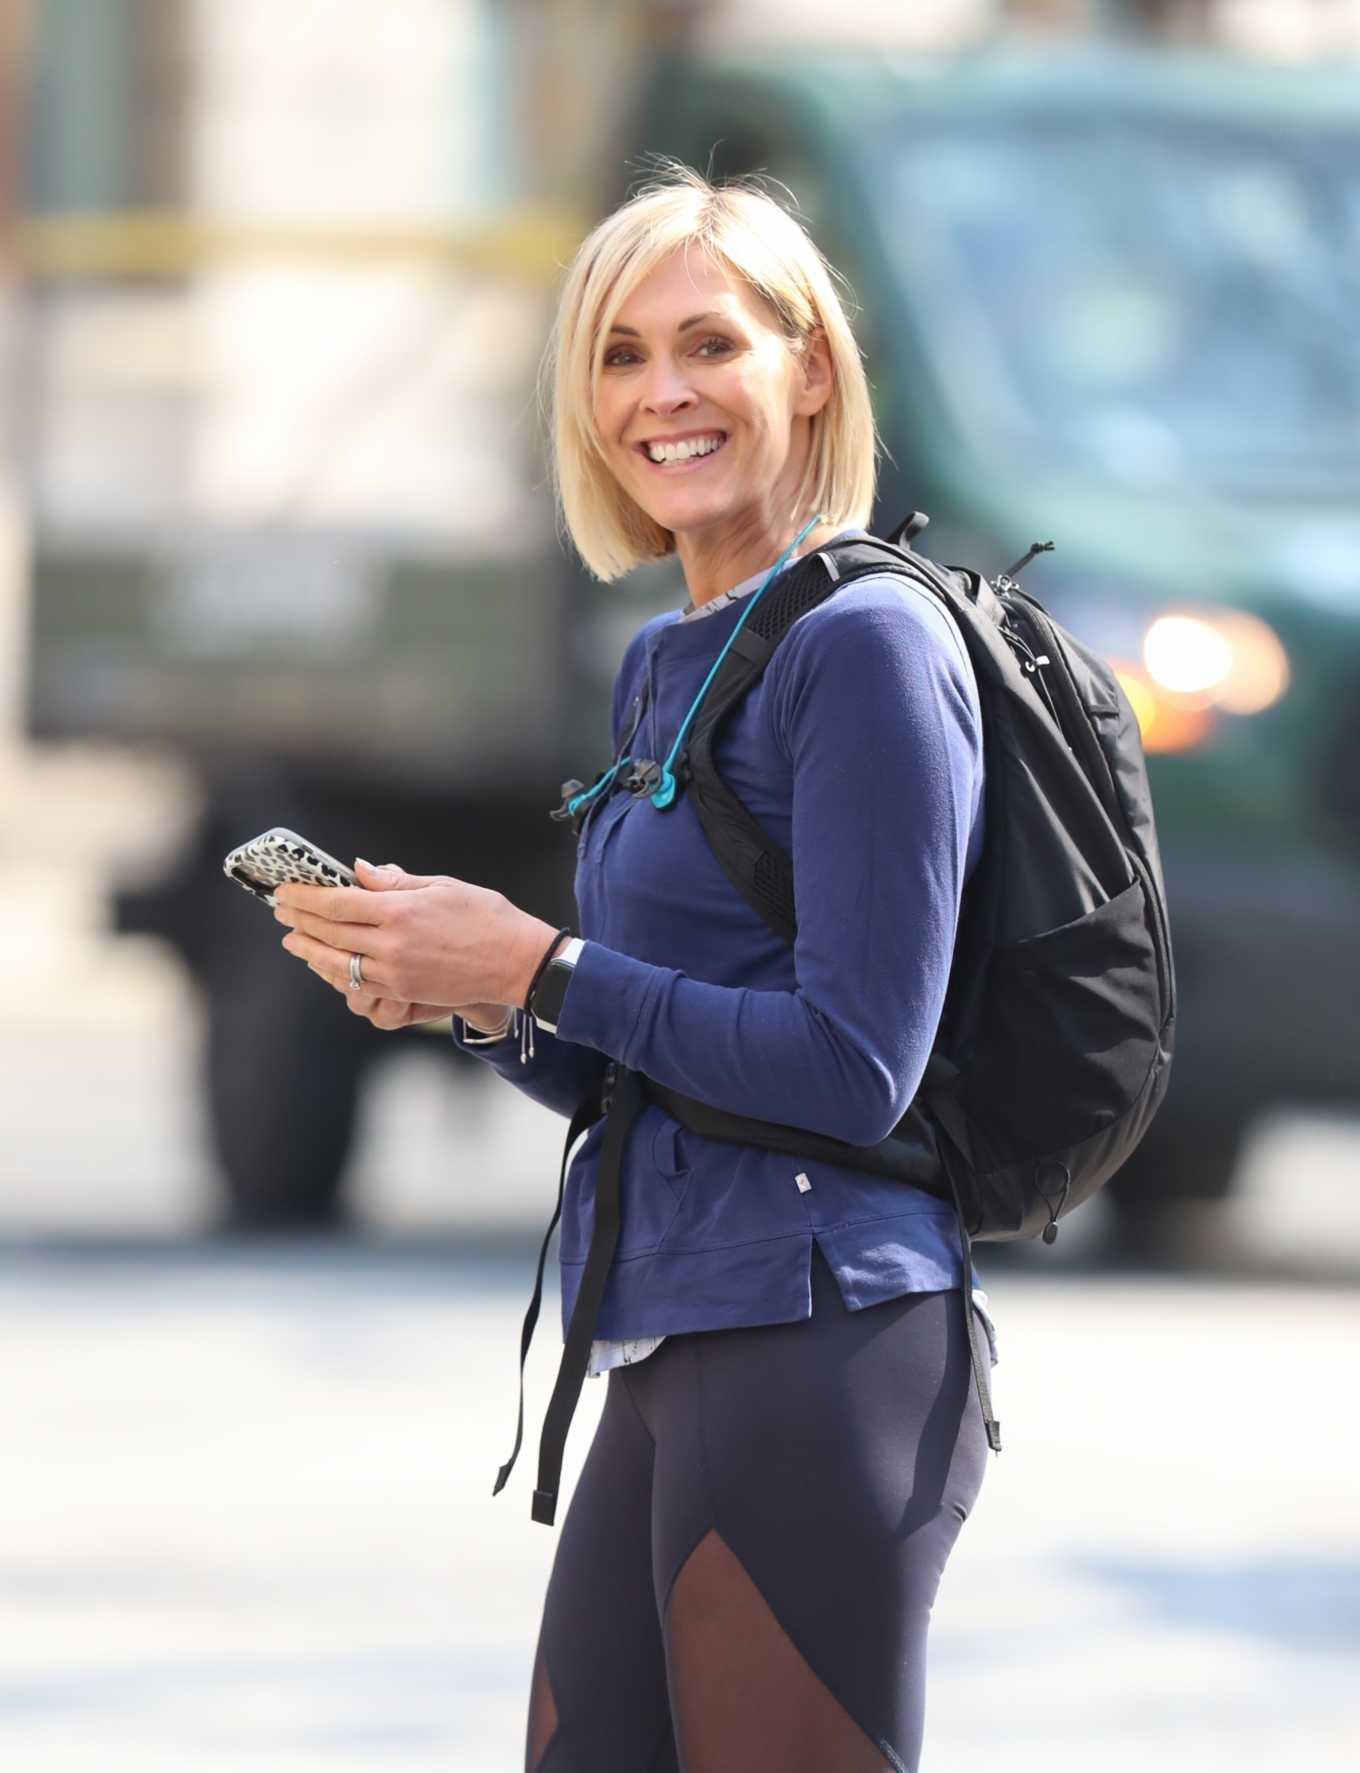 Jenni Falconer 2020 : Jenni Falconer in Tights – Goes for jog in London-03